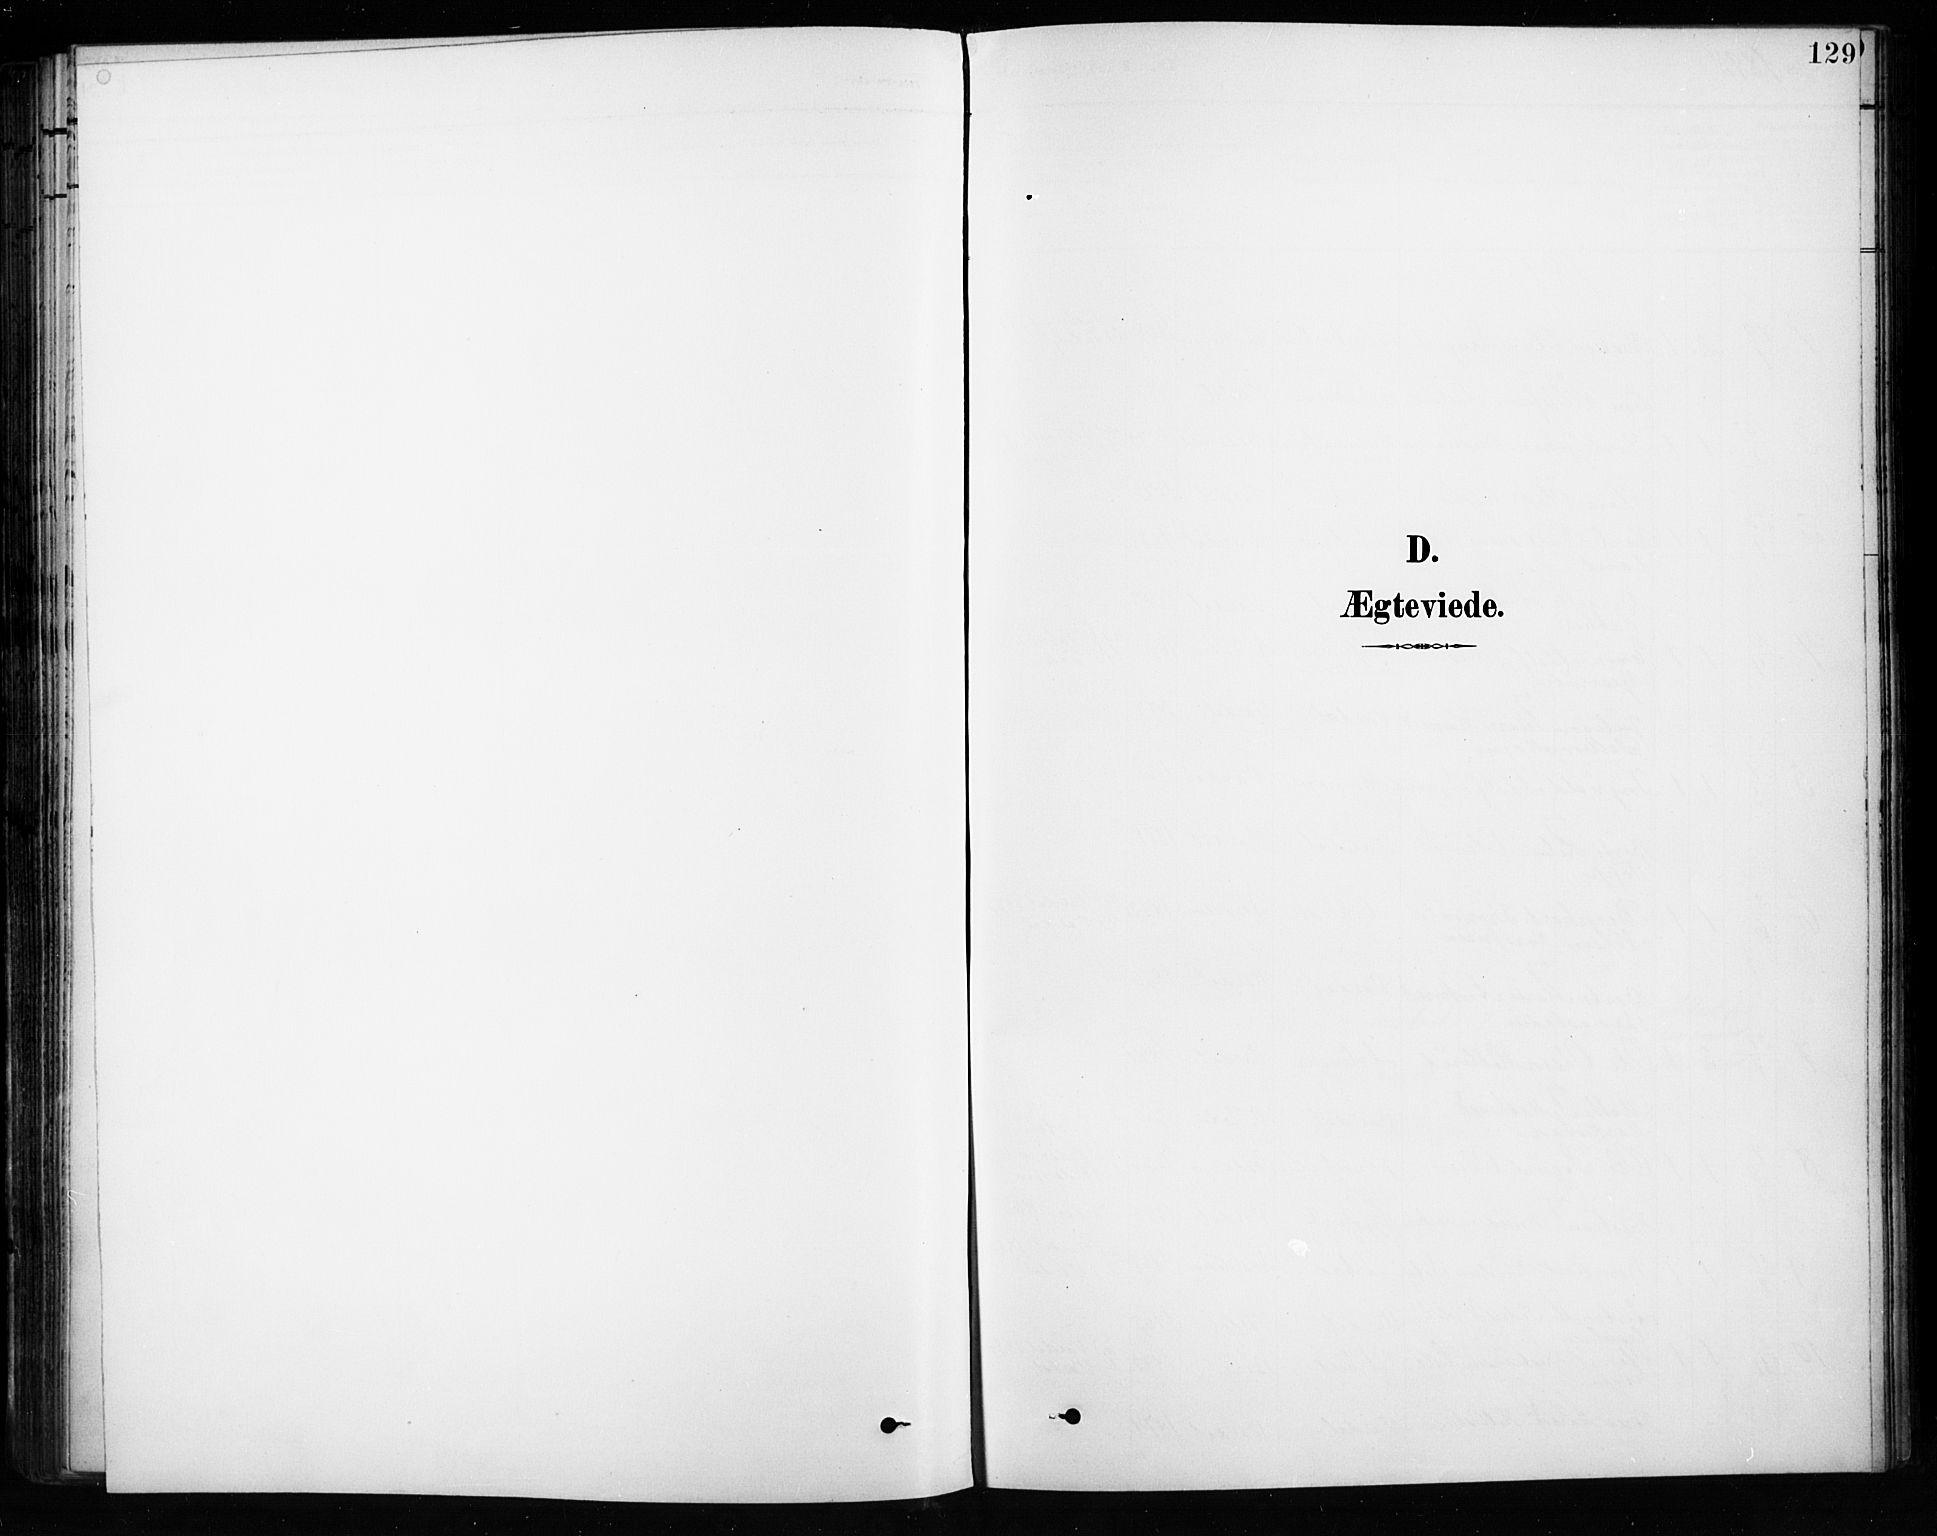 SAH, Vardal prestekontor, H/Ha/Hab/L0010: Klokkerbok nr. 10, 1895-1903, s. 129